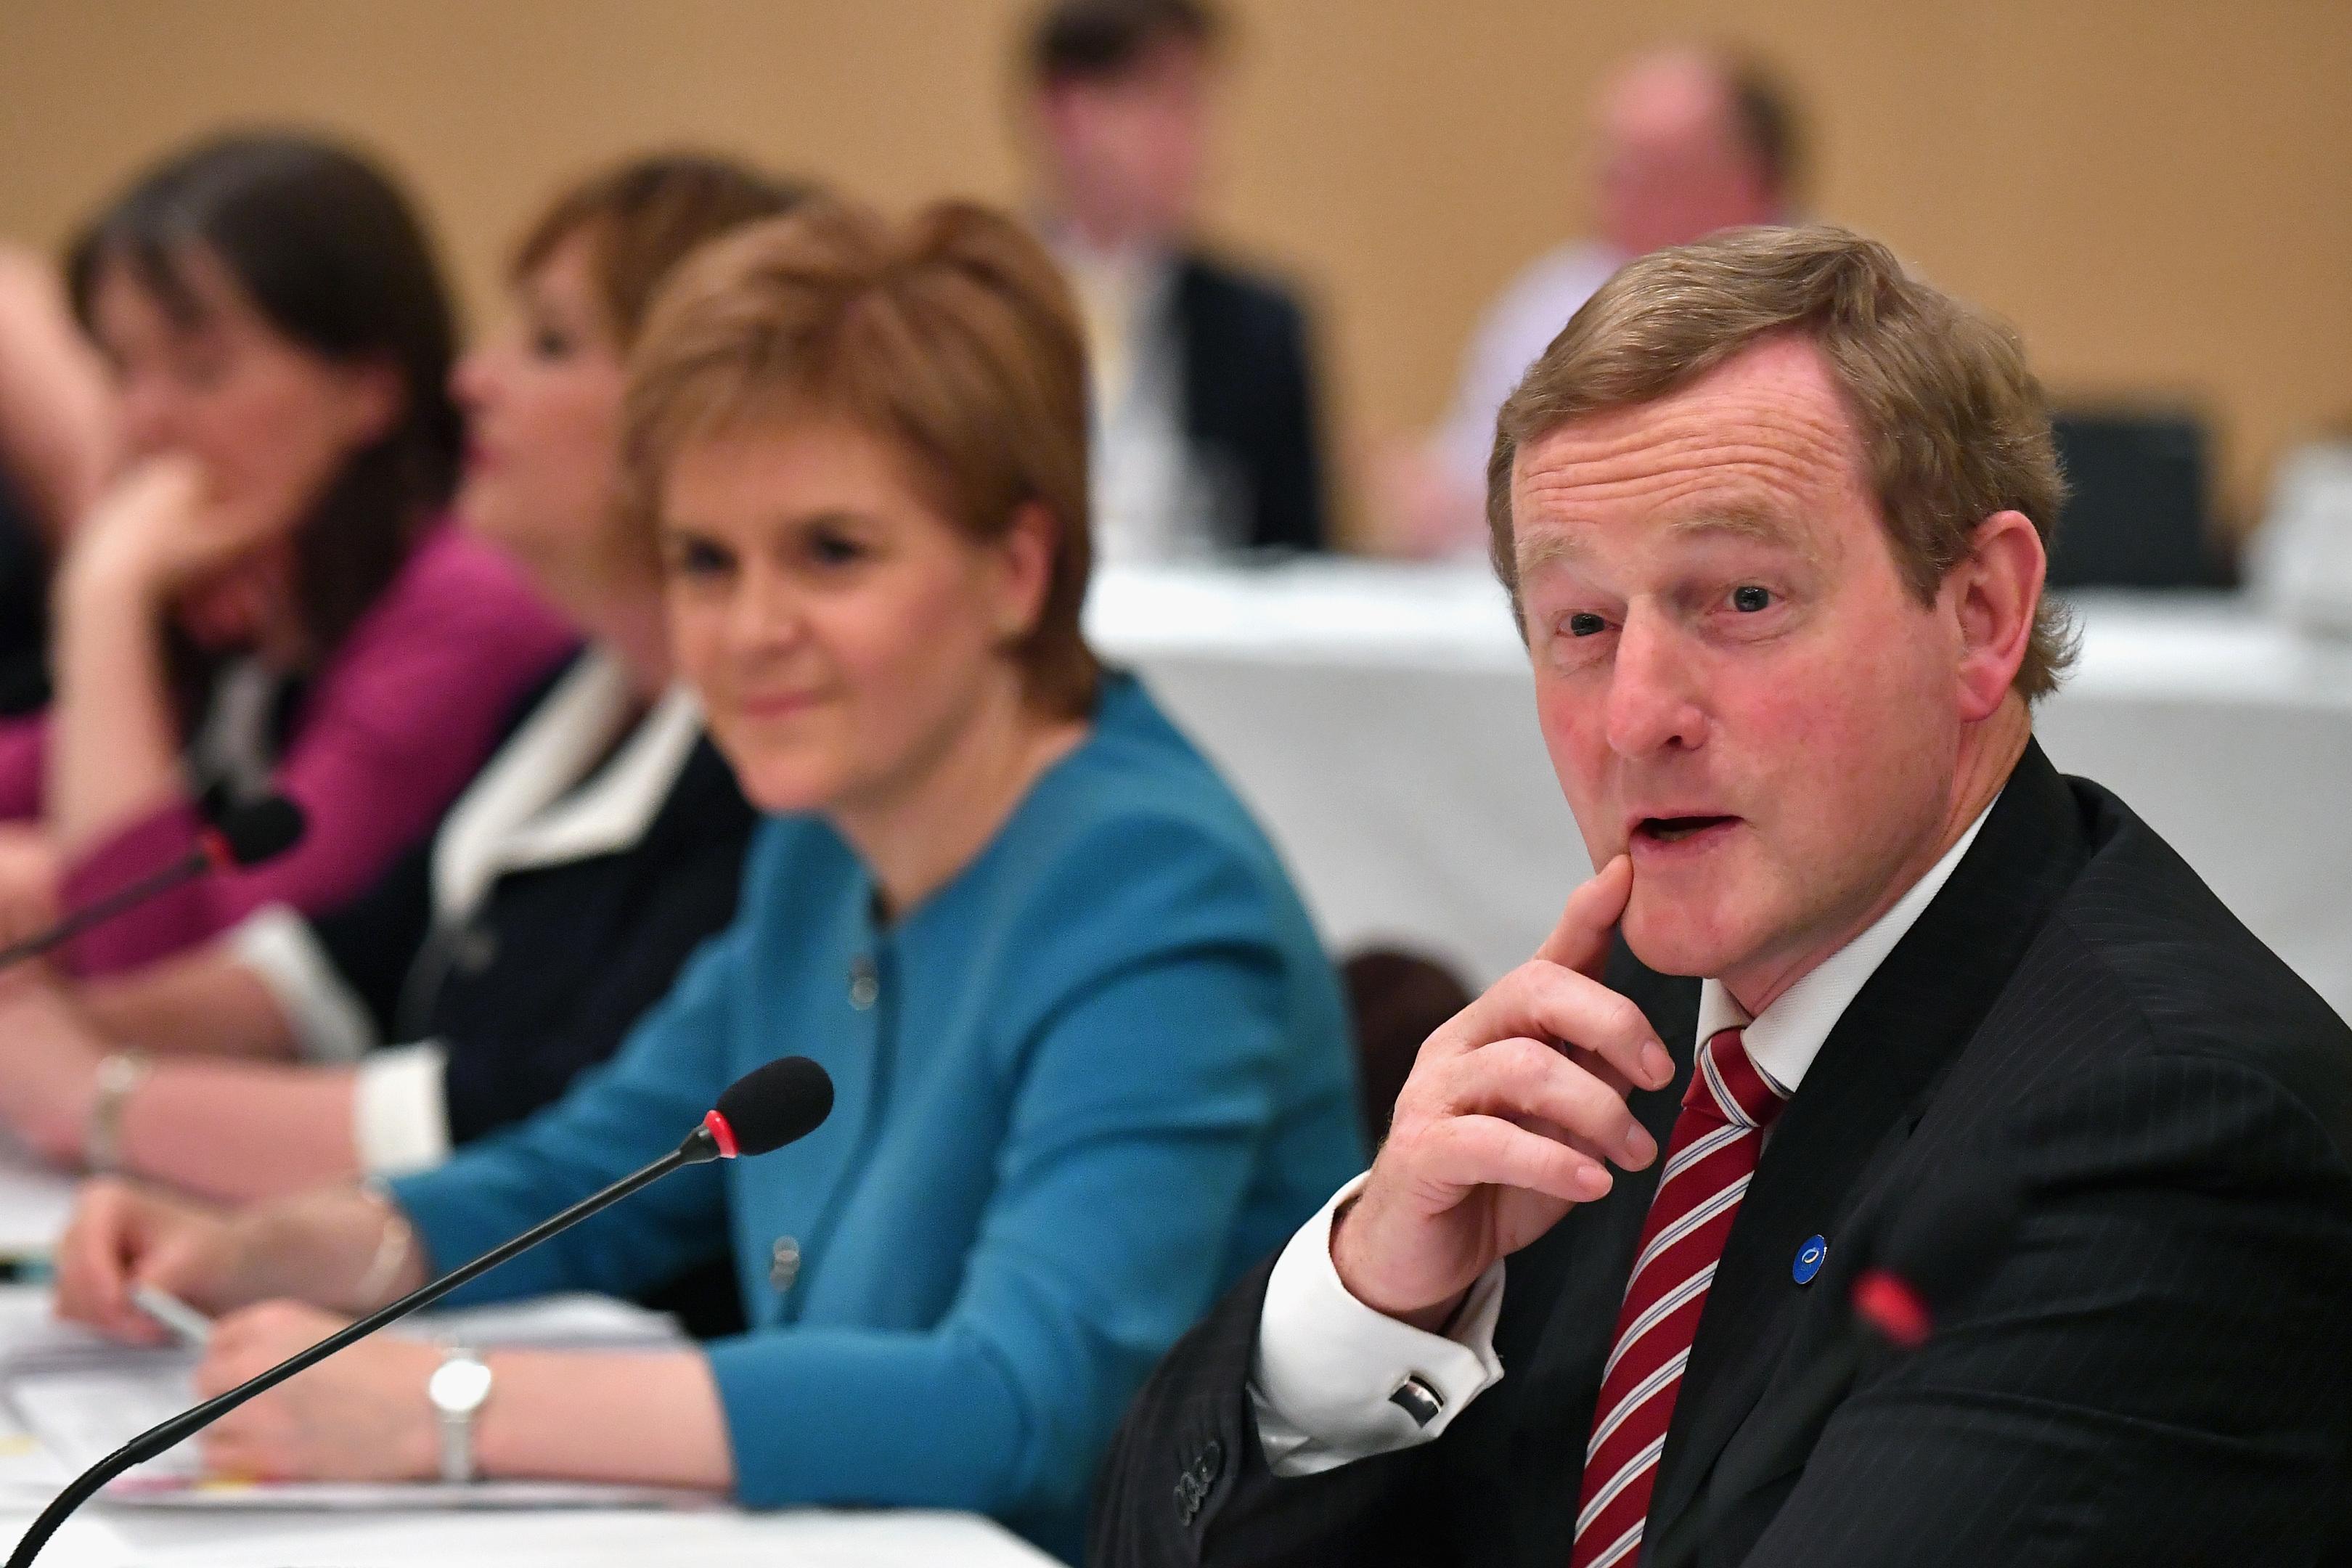 Taoiseach Enda Kenny and Nicola Sturgeon at the British-Irish council meeting in Glasgow.